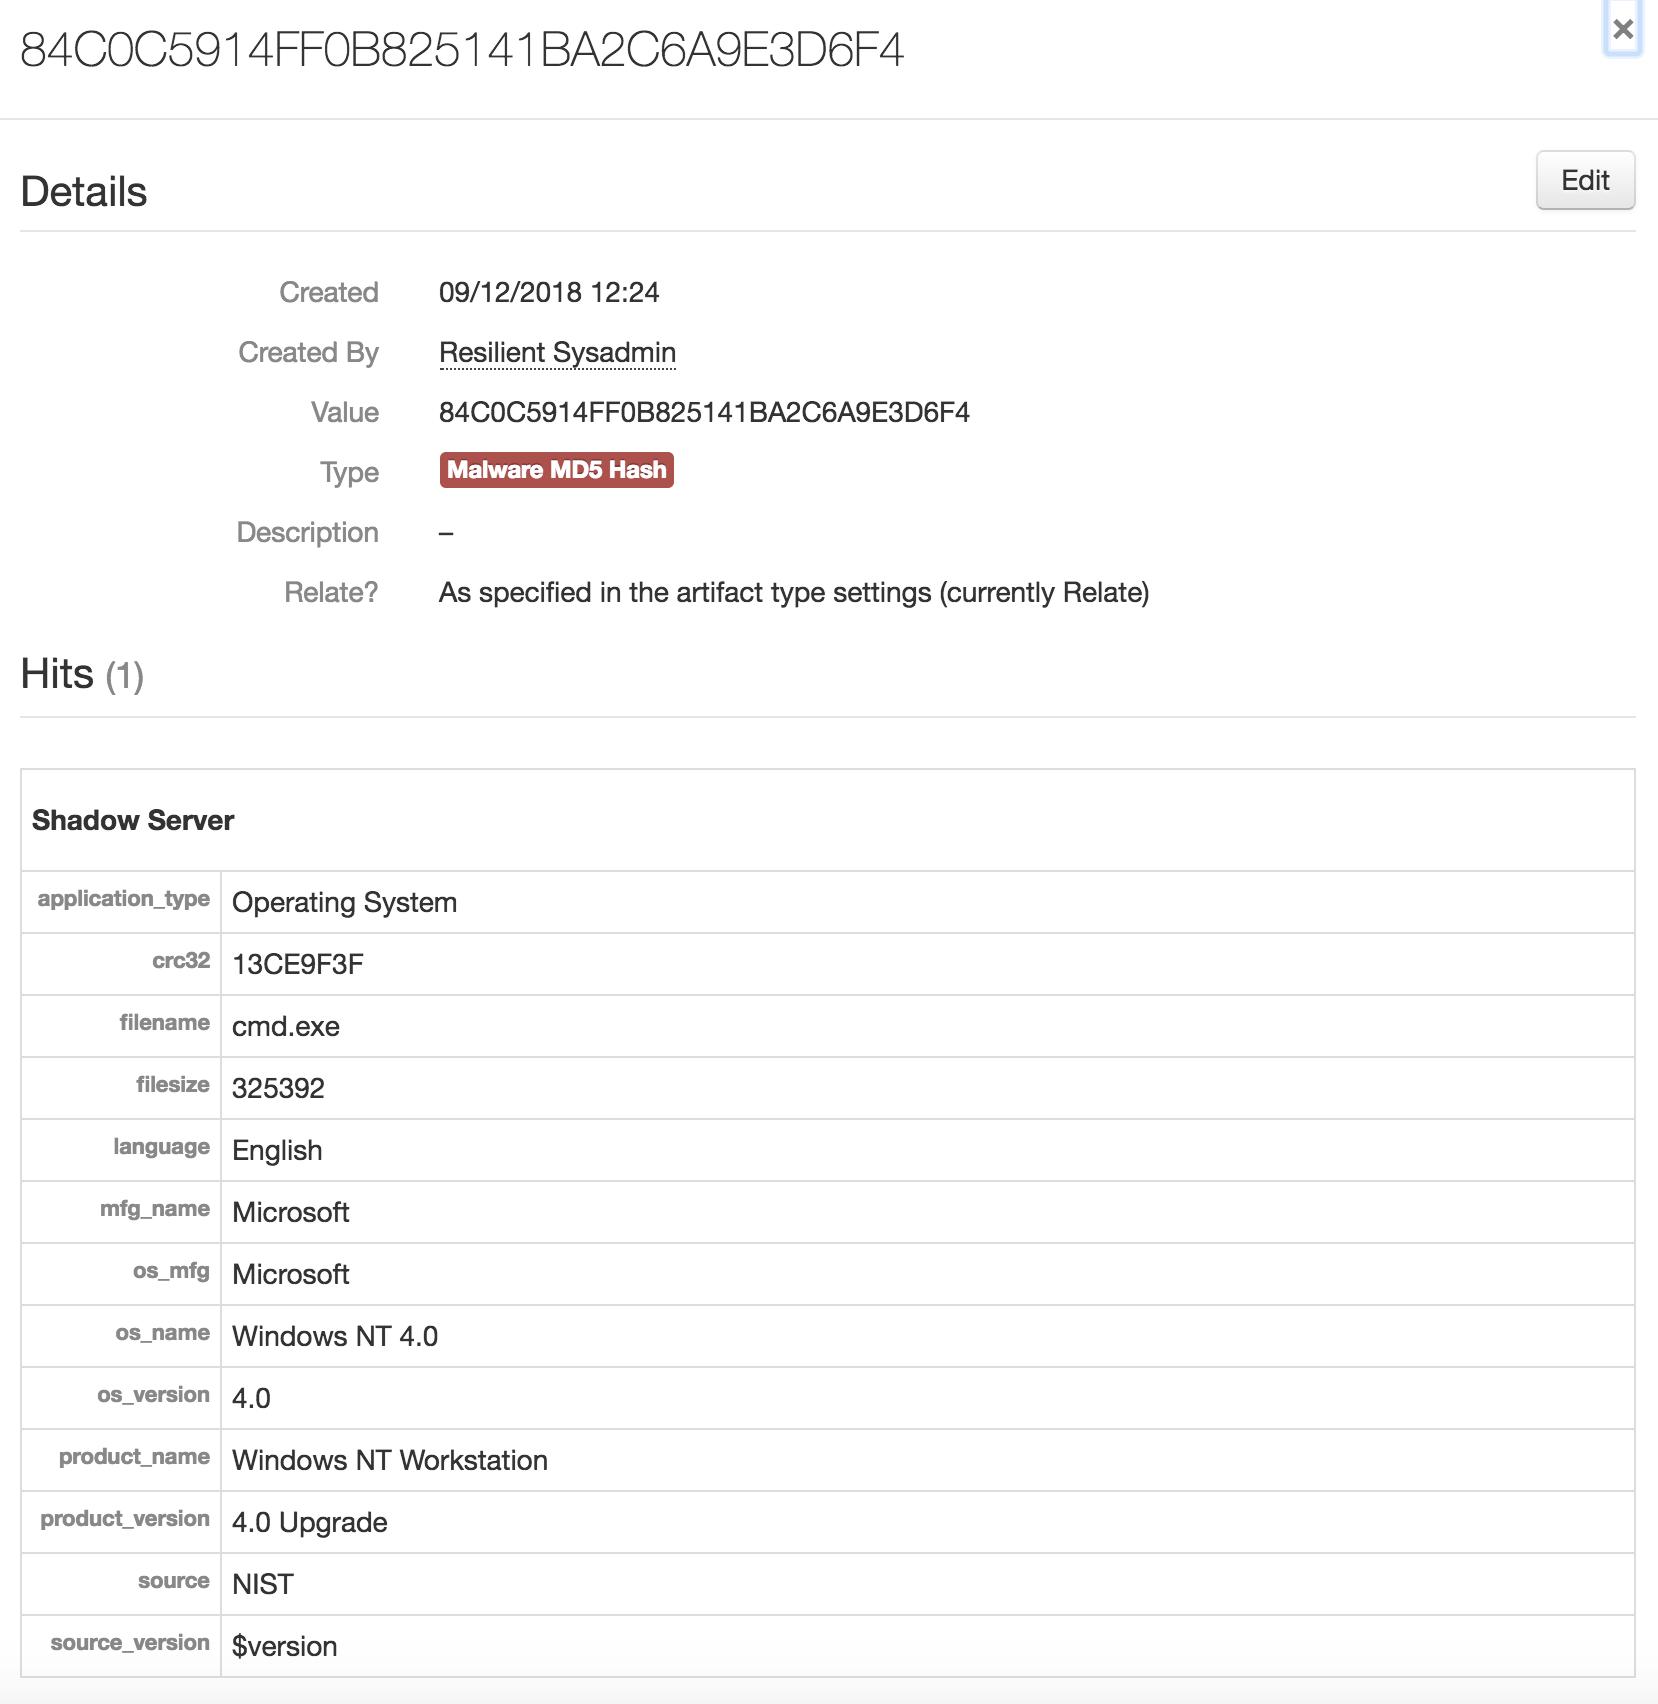 IBM Security App Exchange - Shadowserver Threat Service for